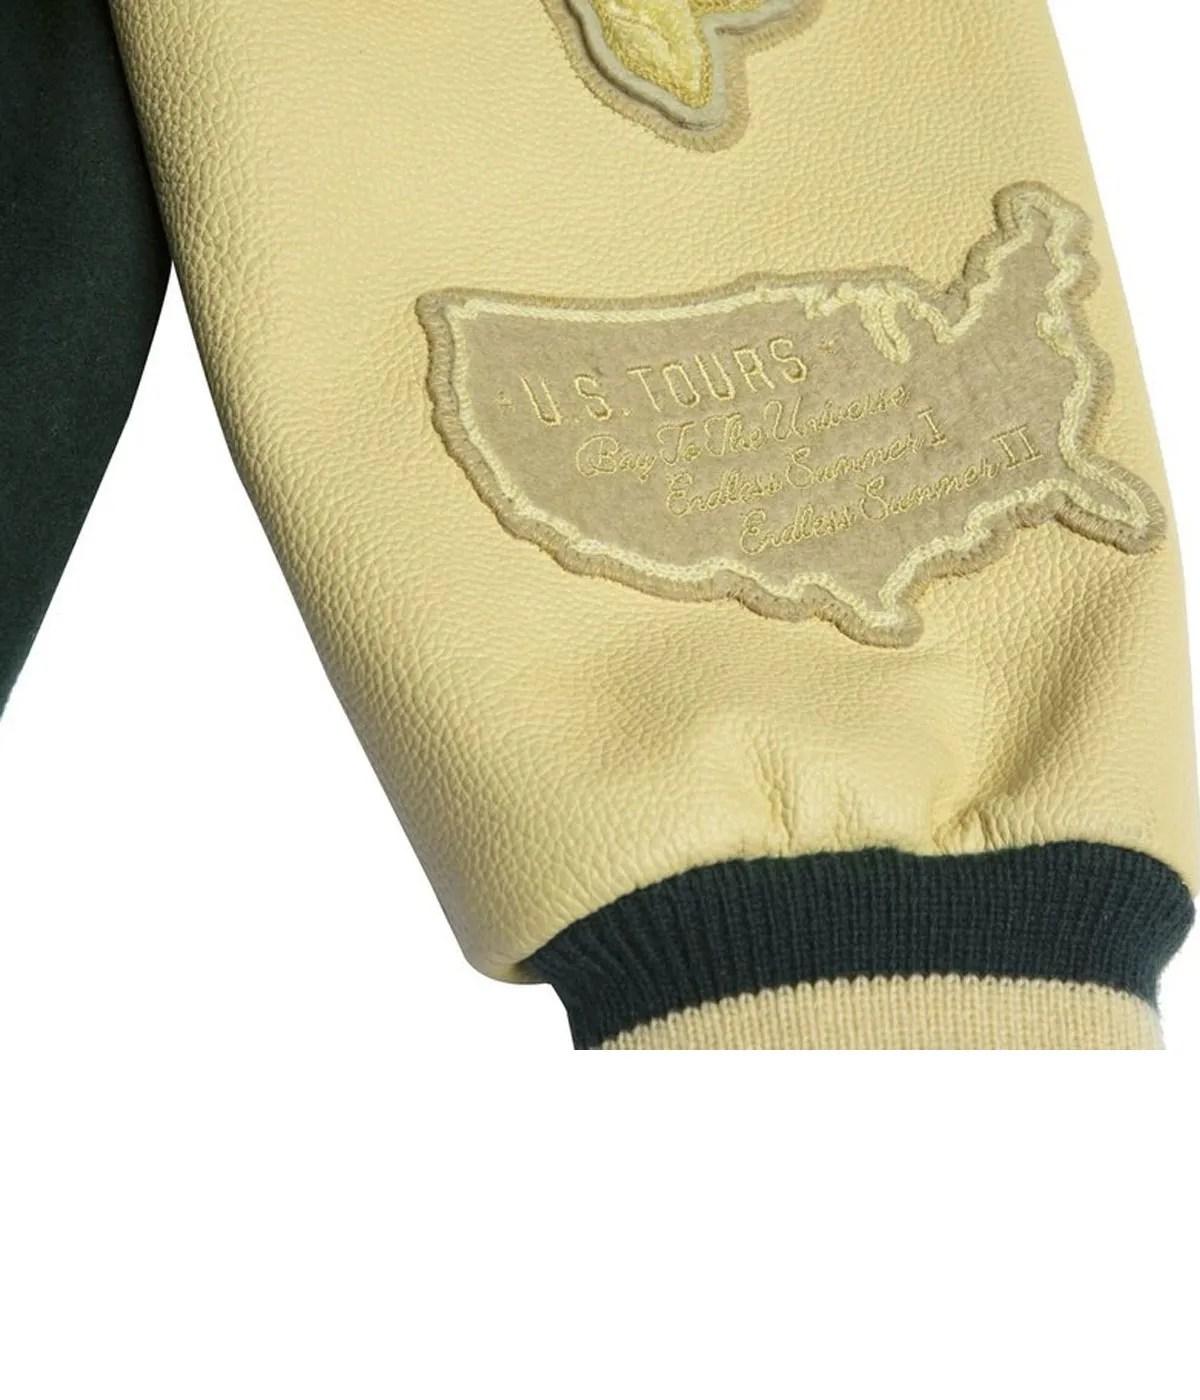 the-accolade-jacket